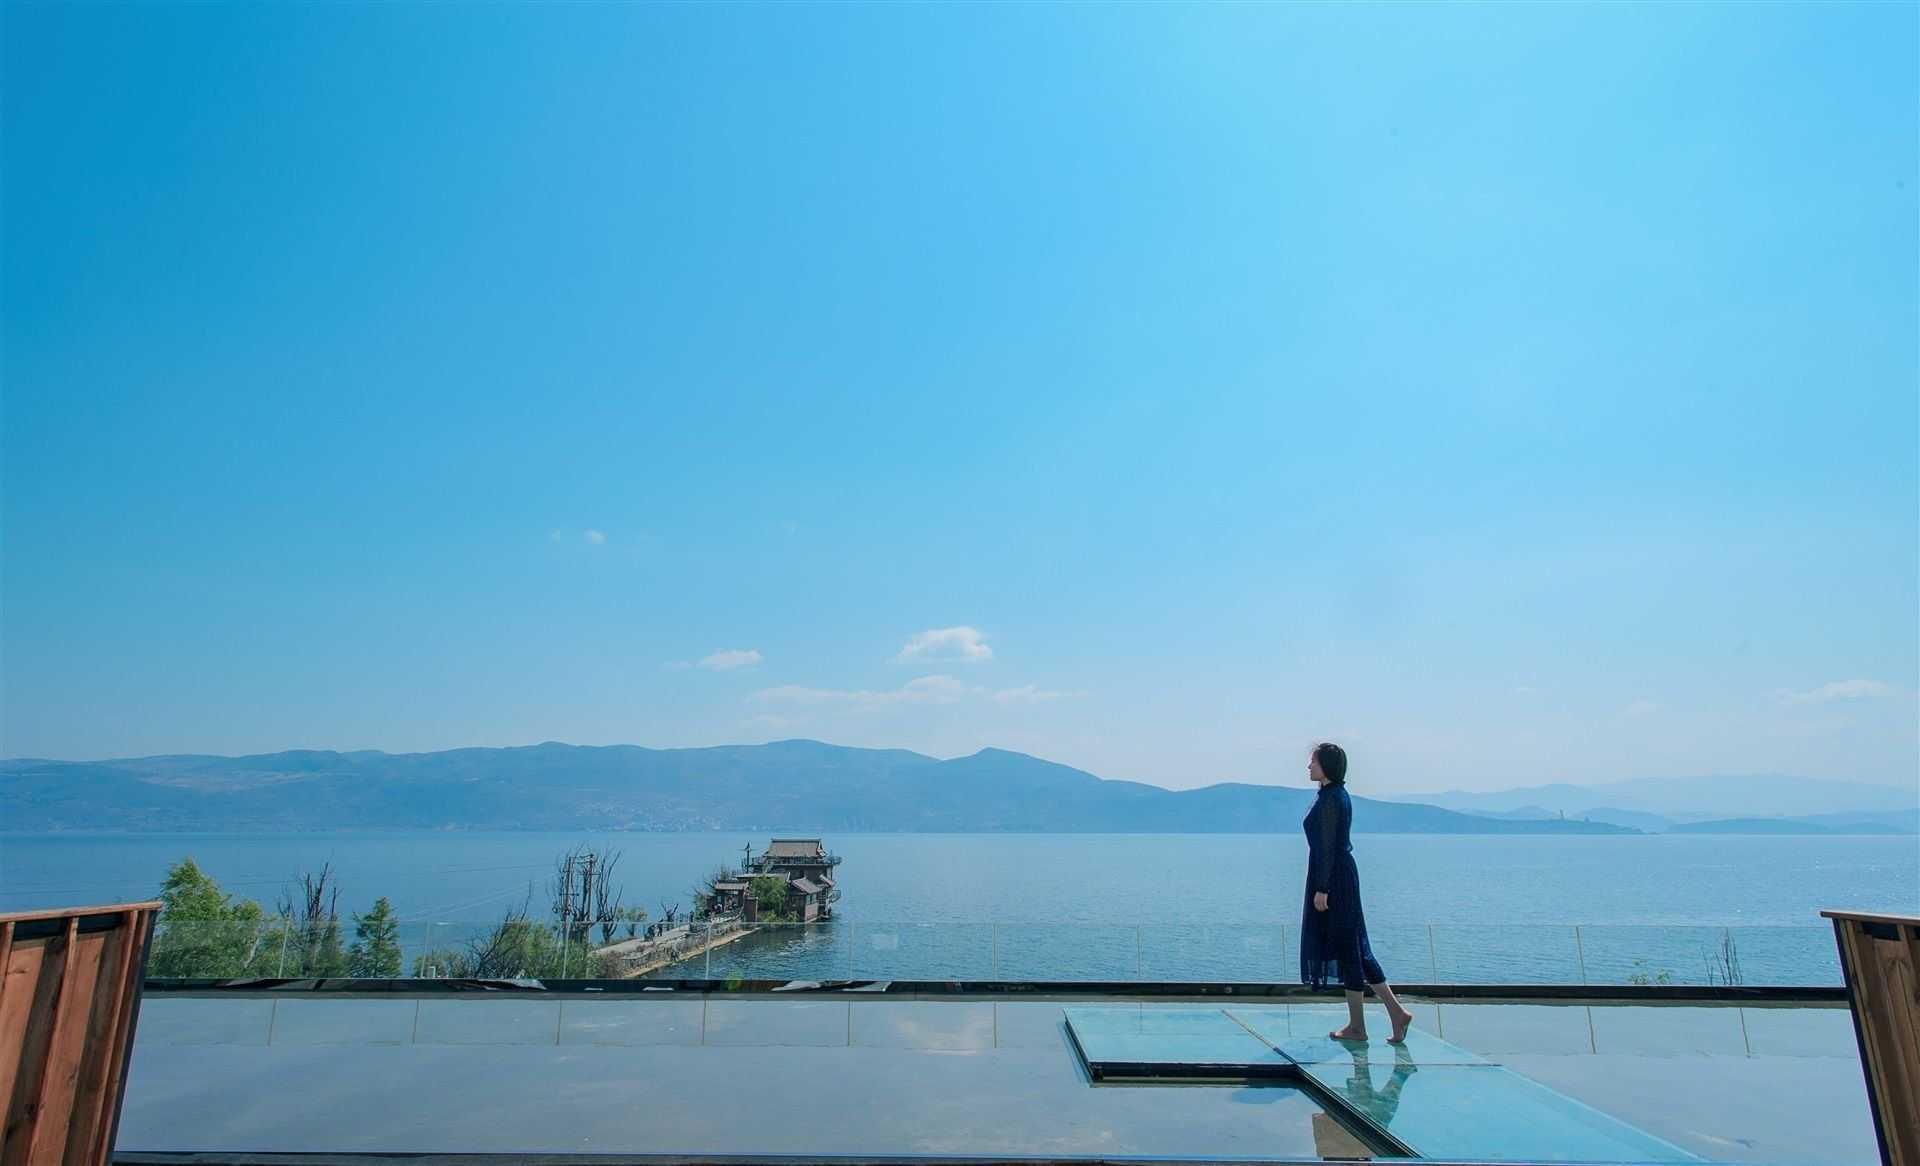 Dali Pure Sea Travelling With Hotel -